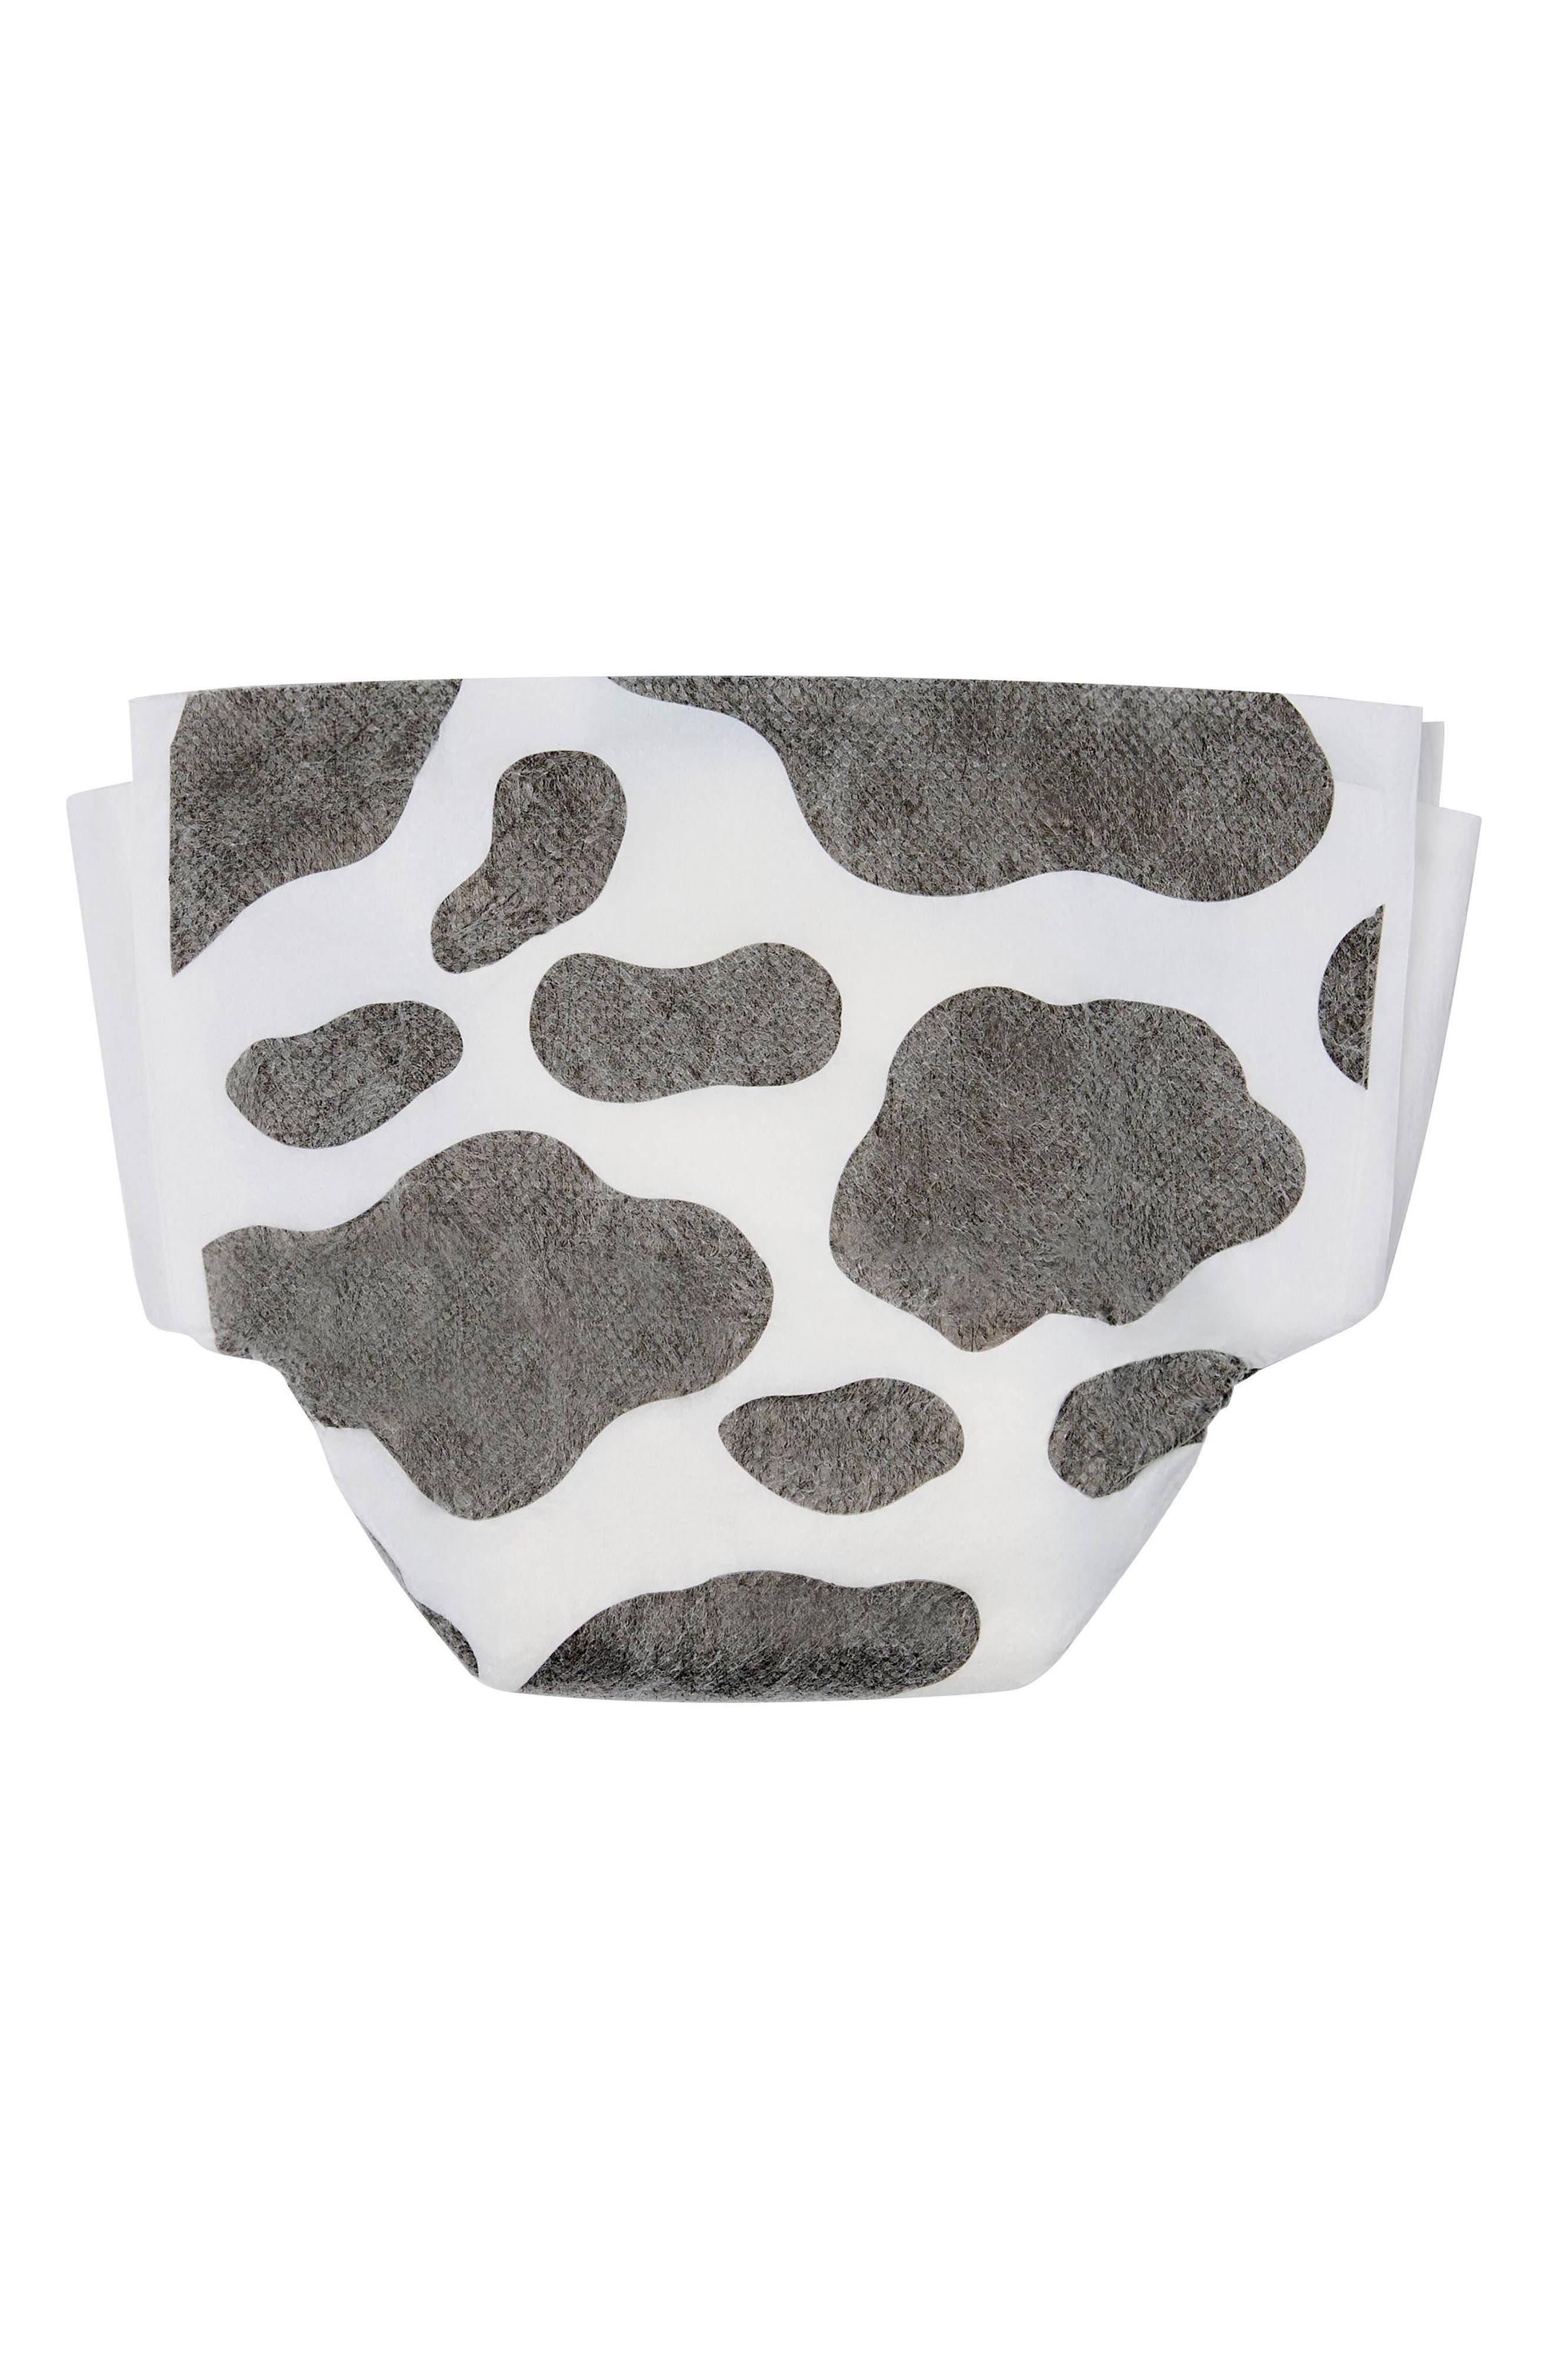 Main Image - The Honest Company Many Moos Diapers